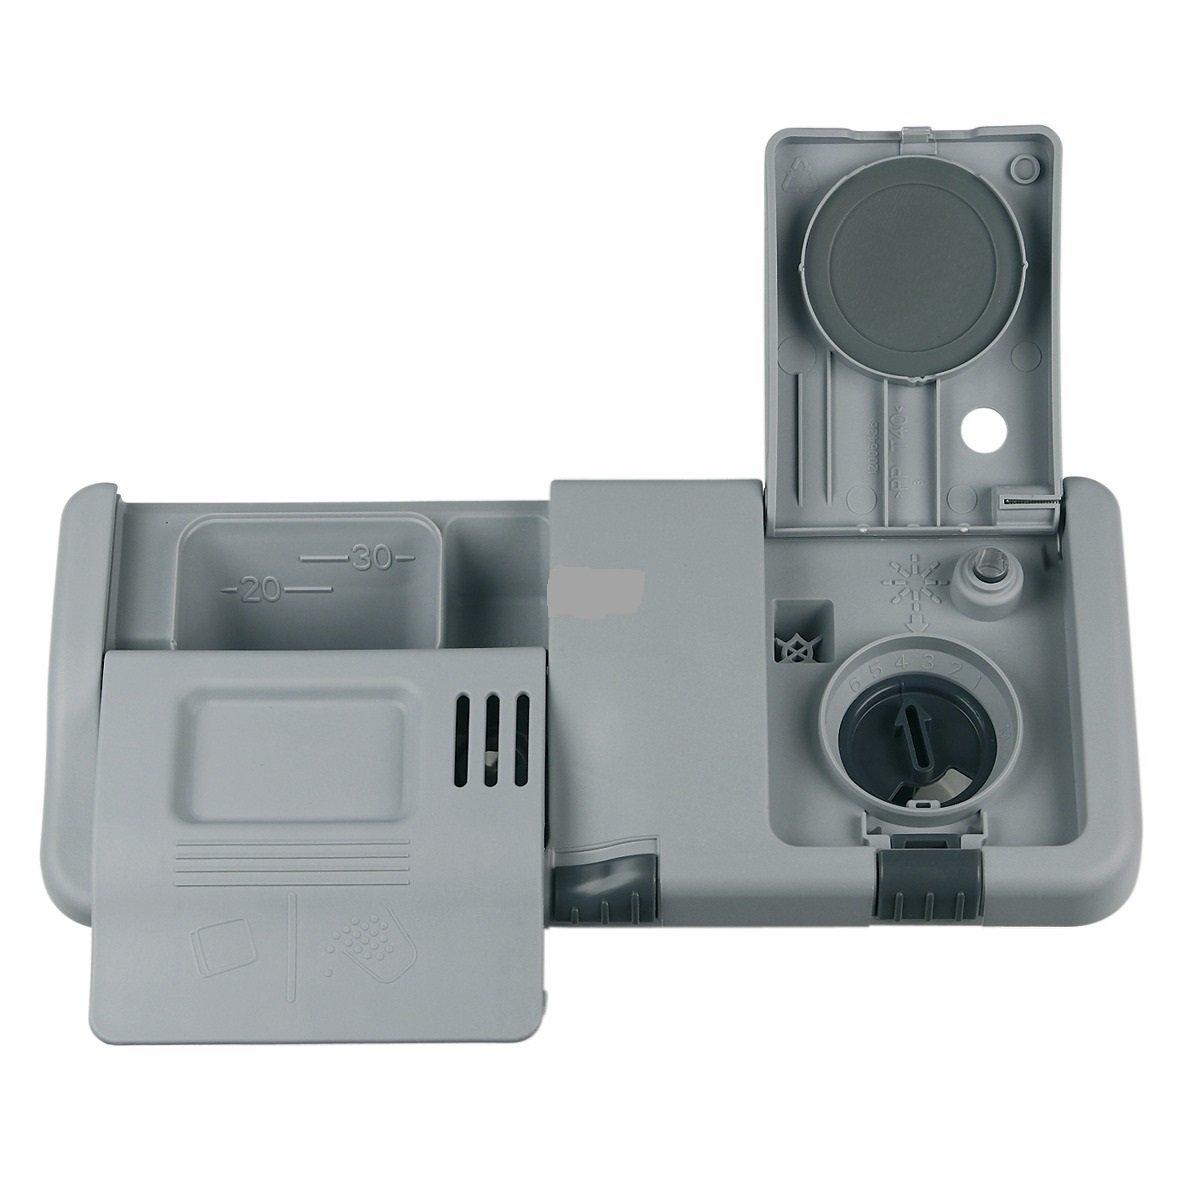 NEU 480140101374 Dosierkombination  Whirlpool Bauknecht Ignis IKEA